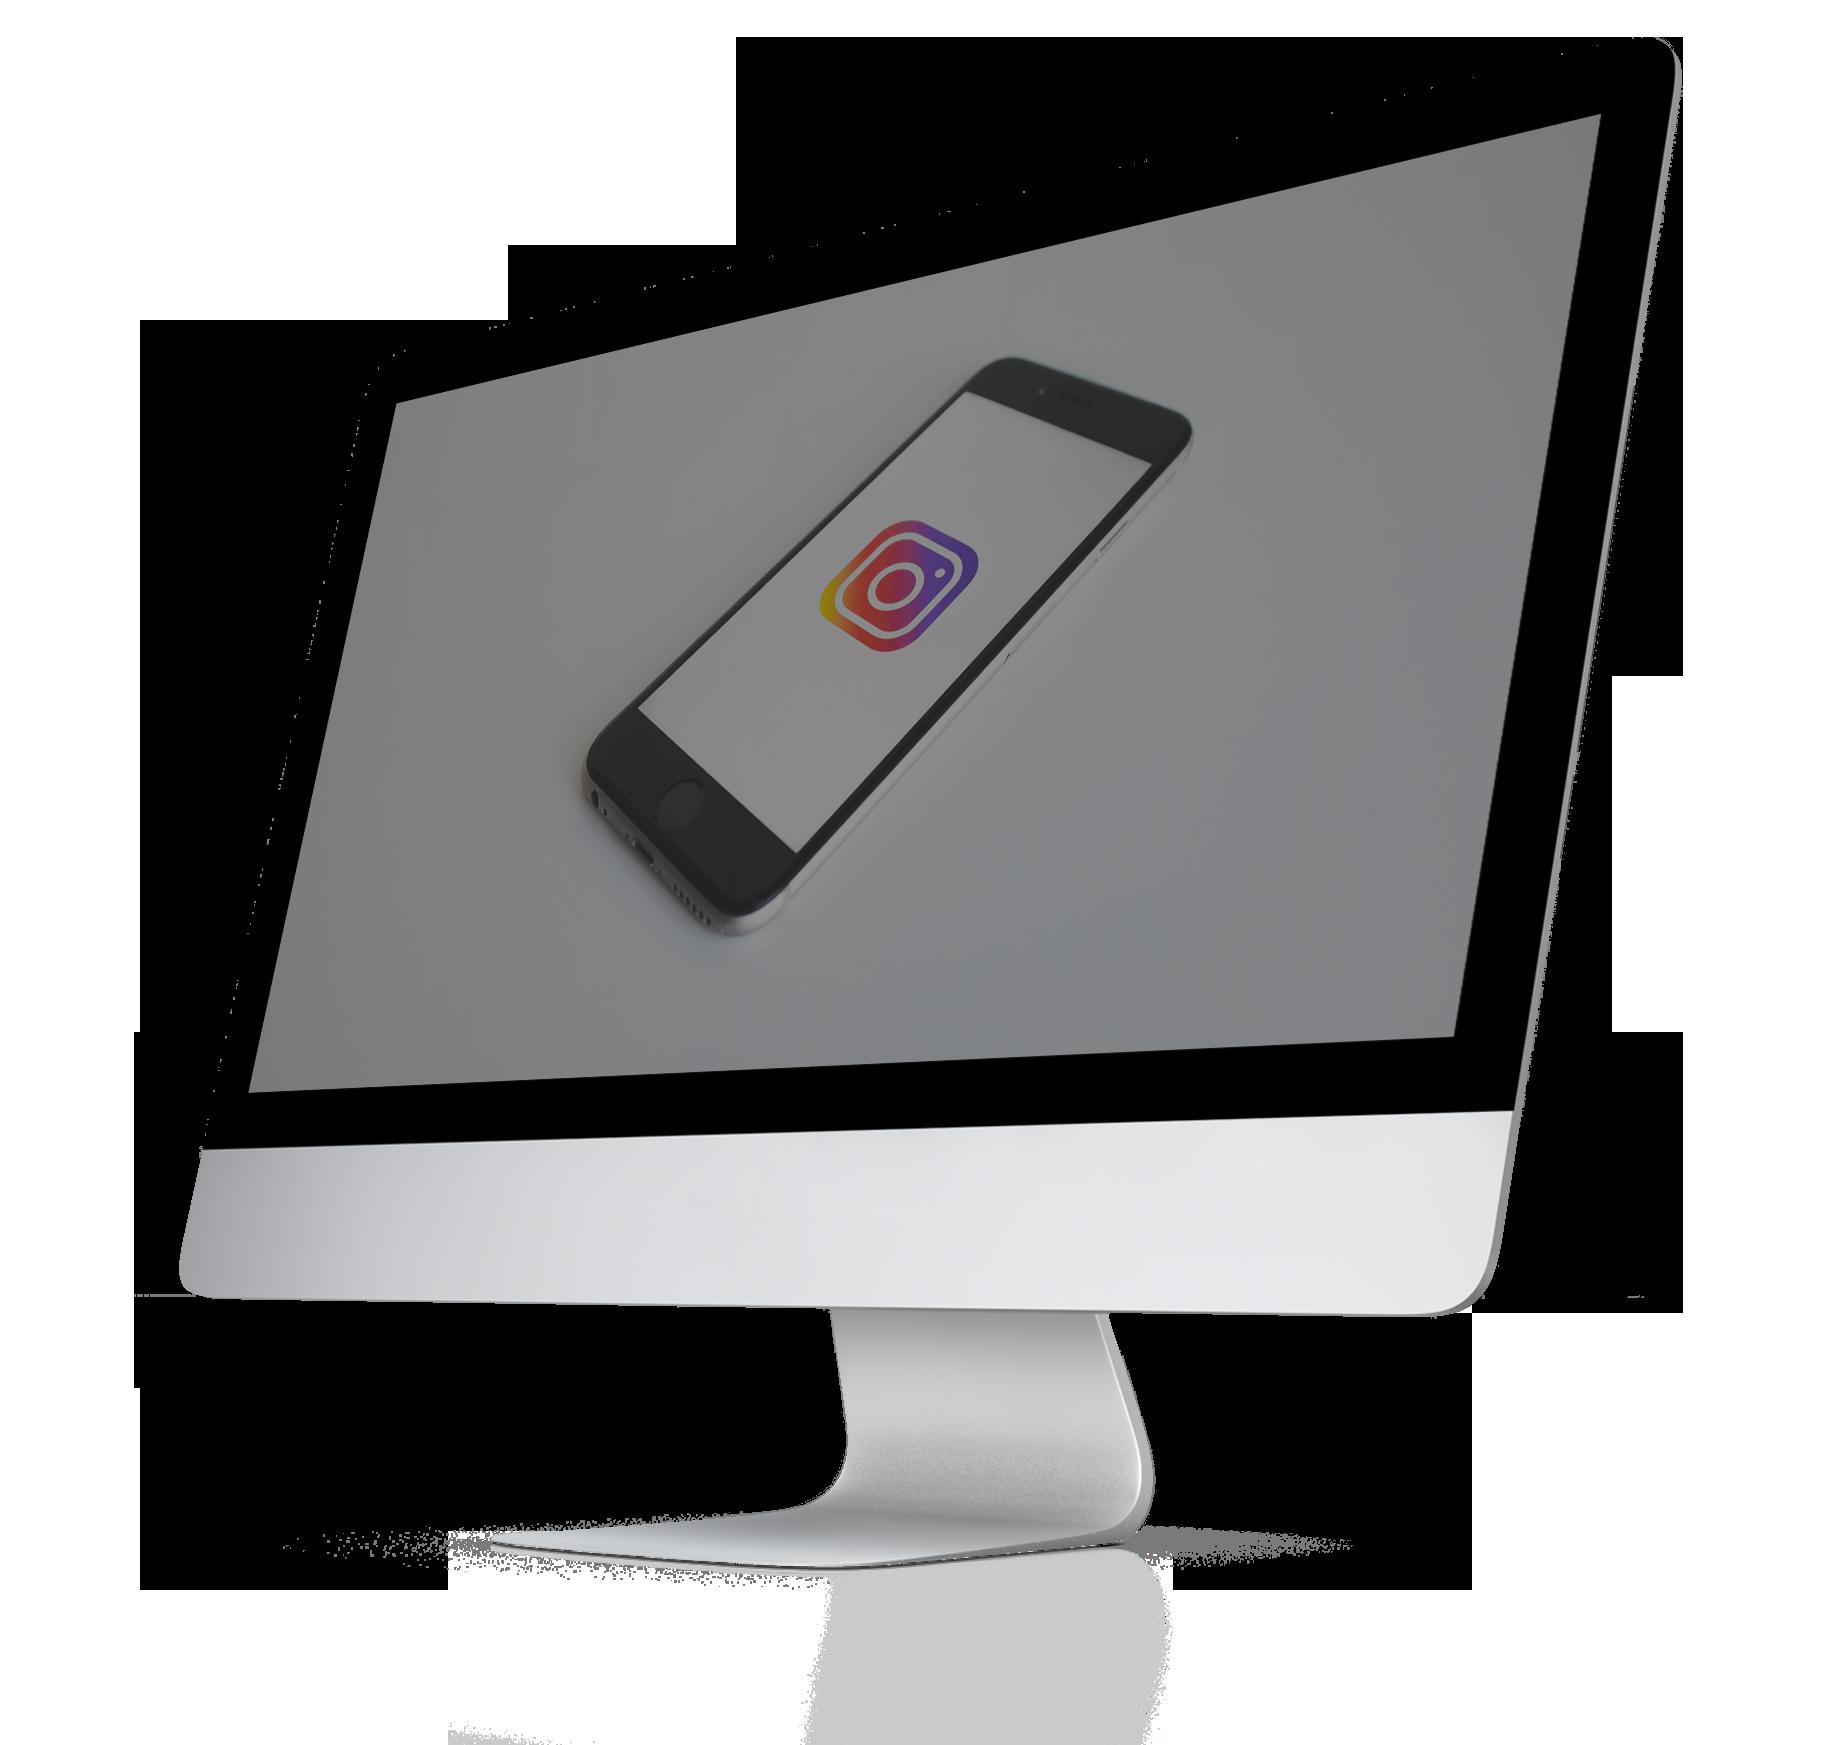 instagram logo on imac screen